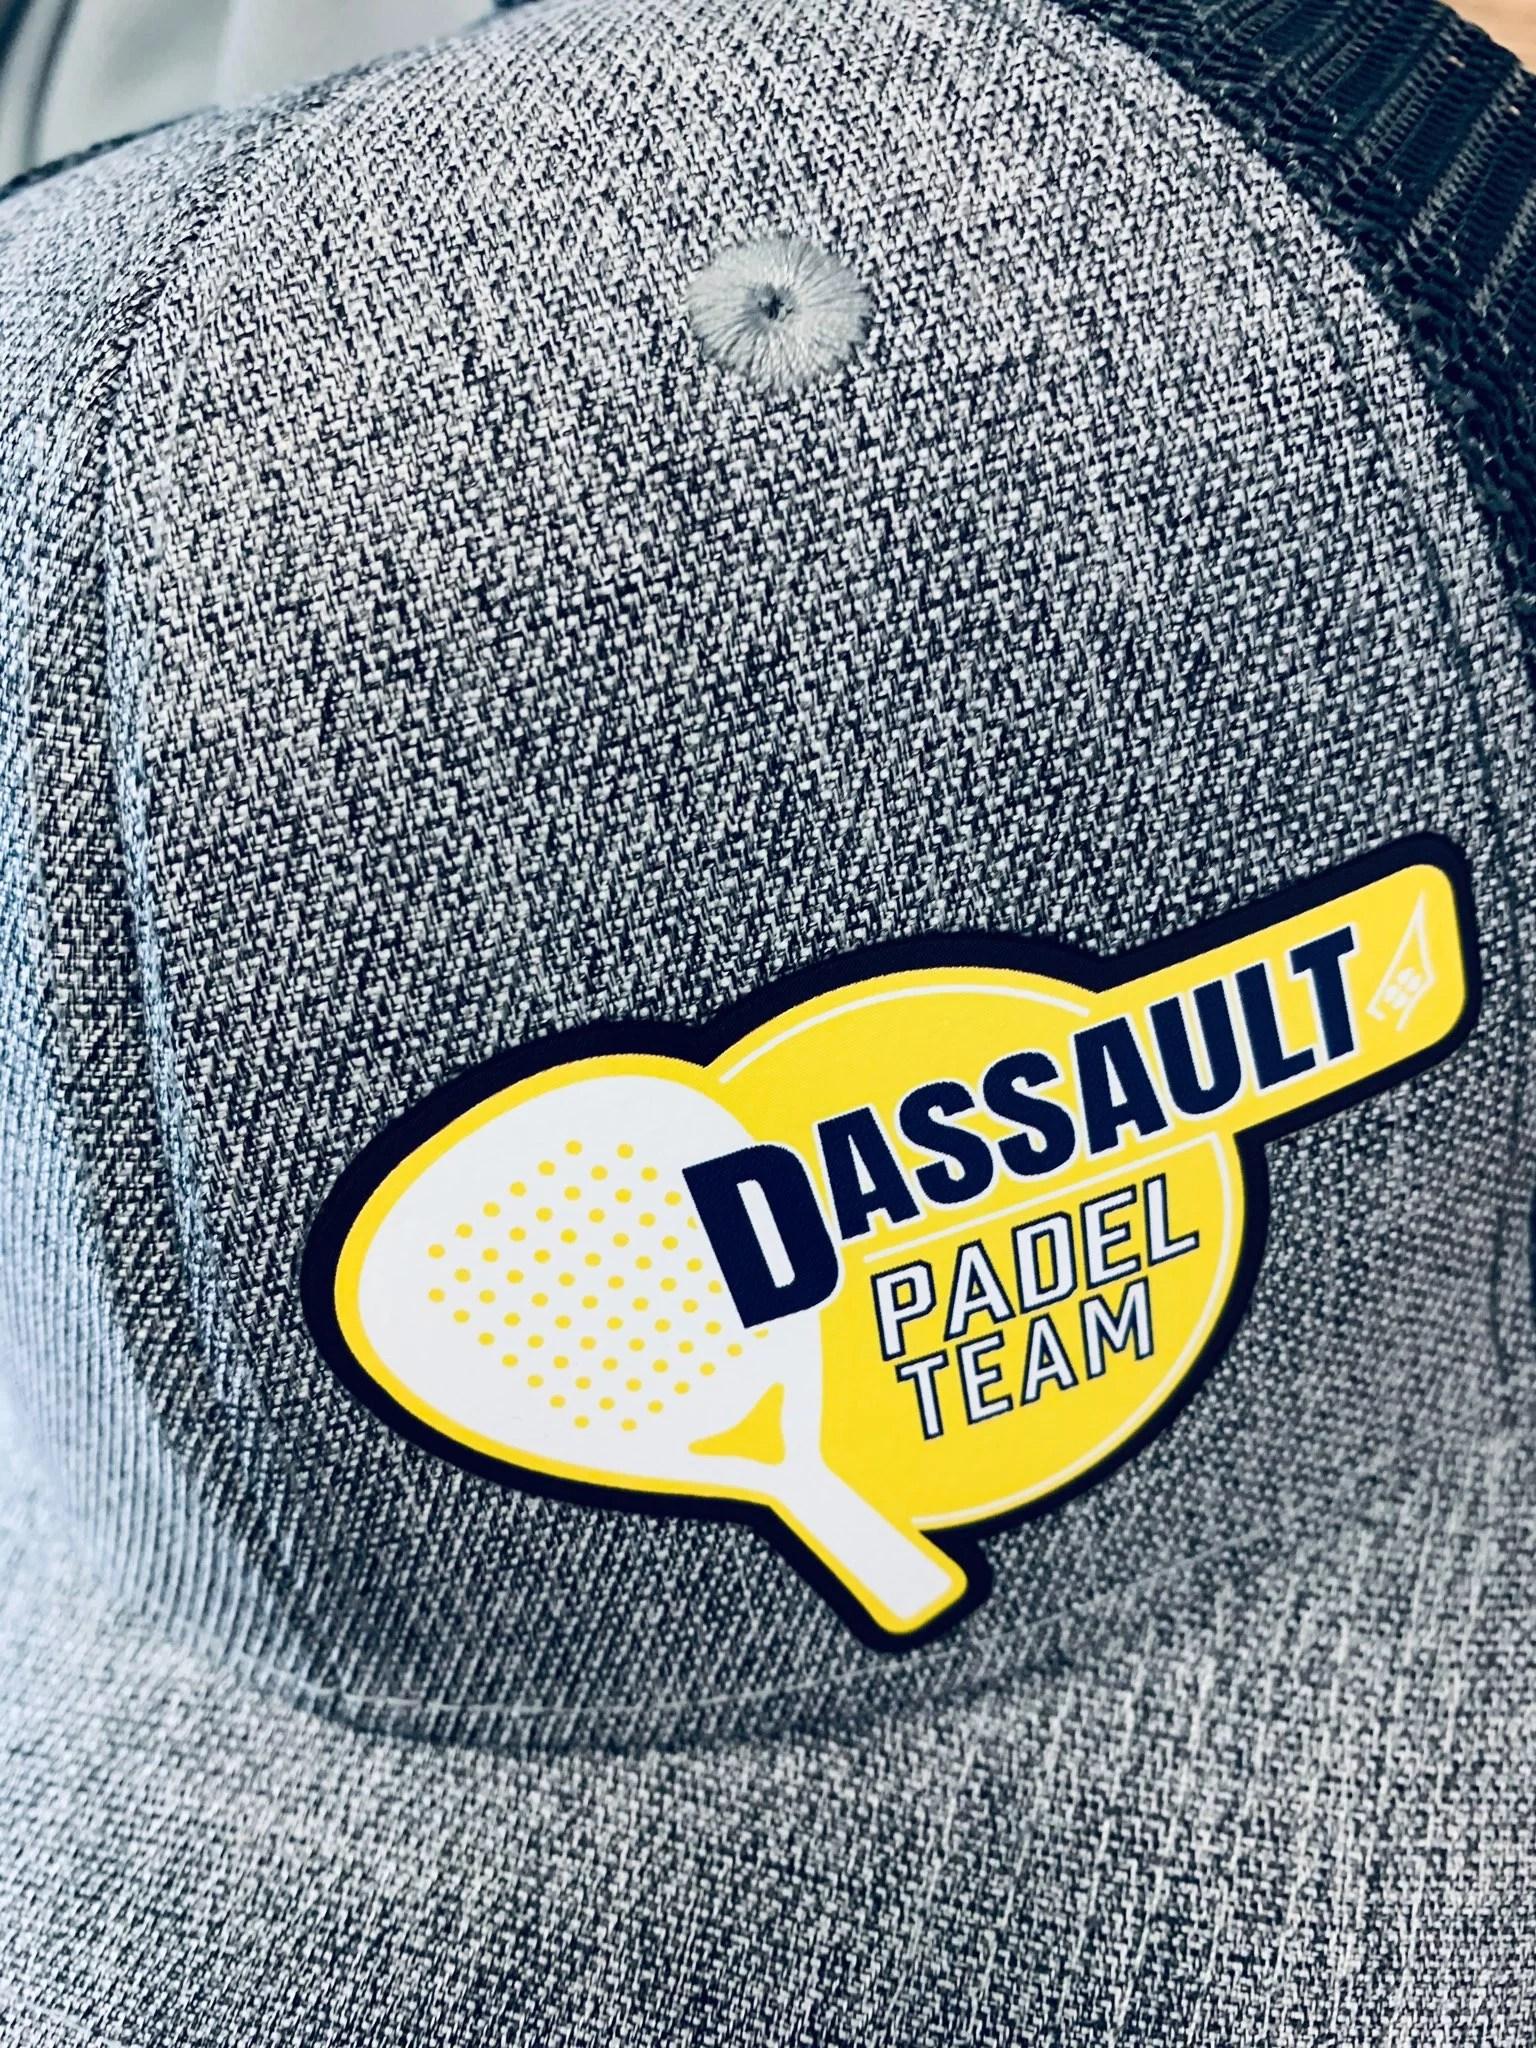 casquette-dassault-pmd